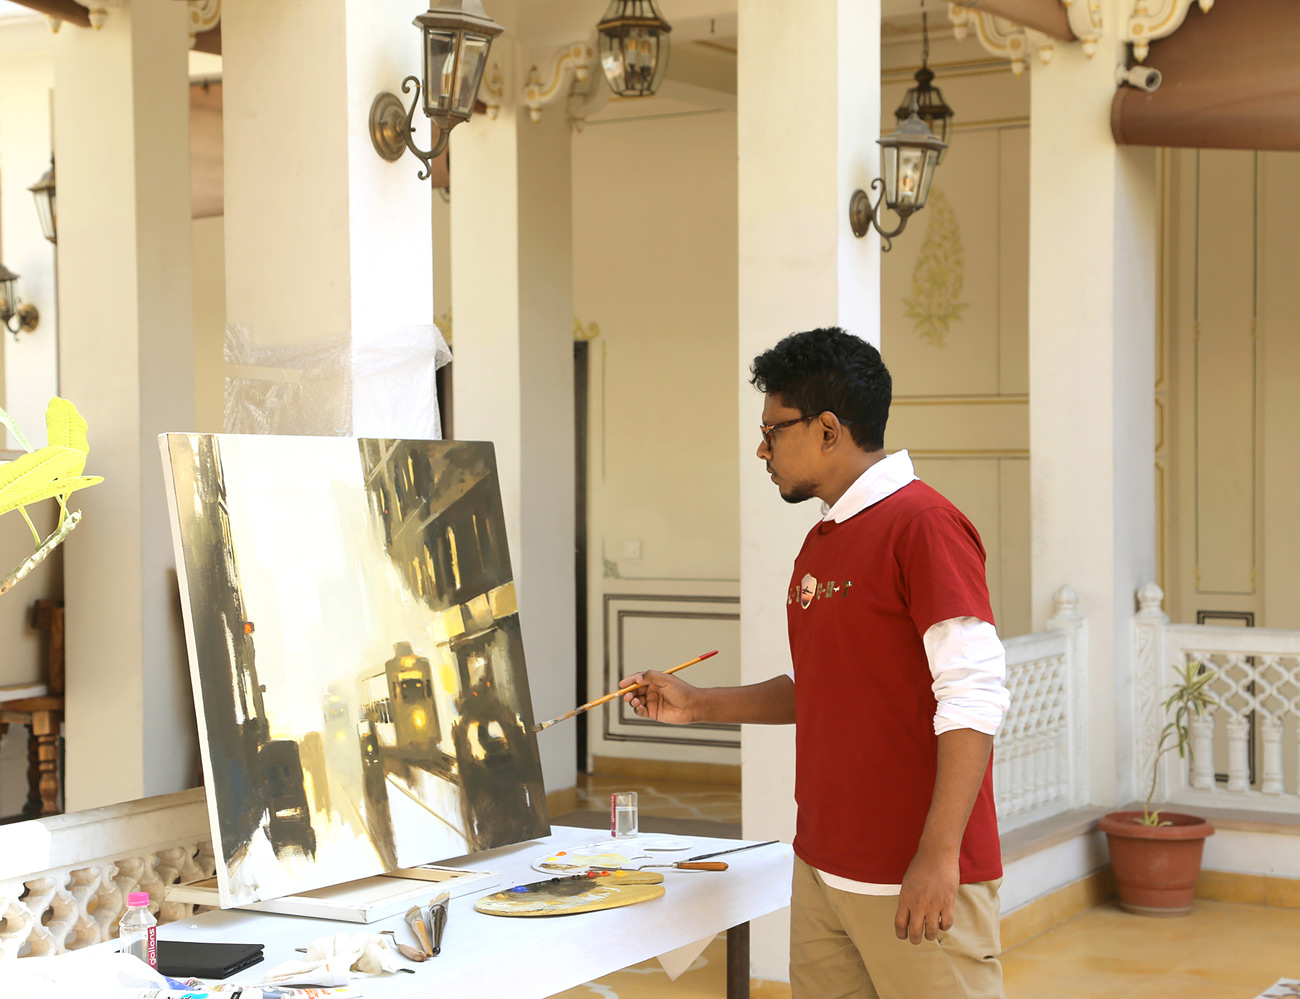 Ananta Mandal in Jaipur Art Camp, Rajasthan